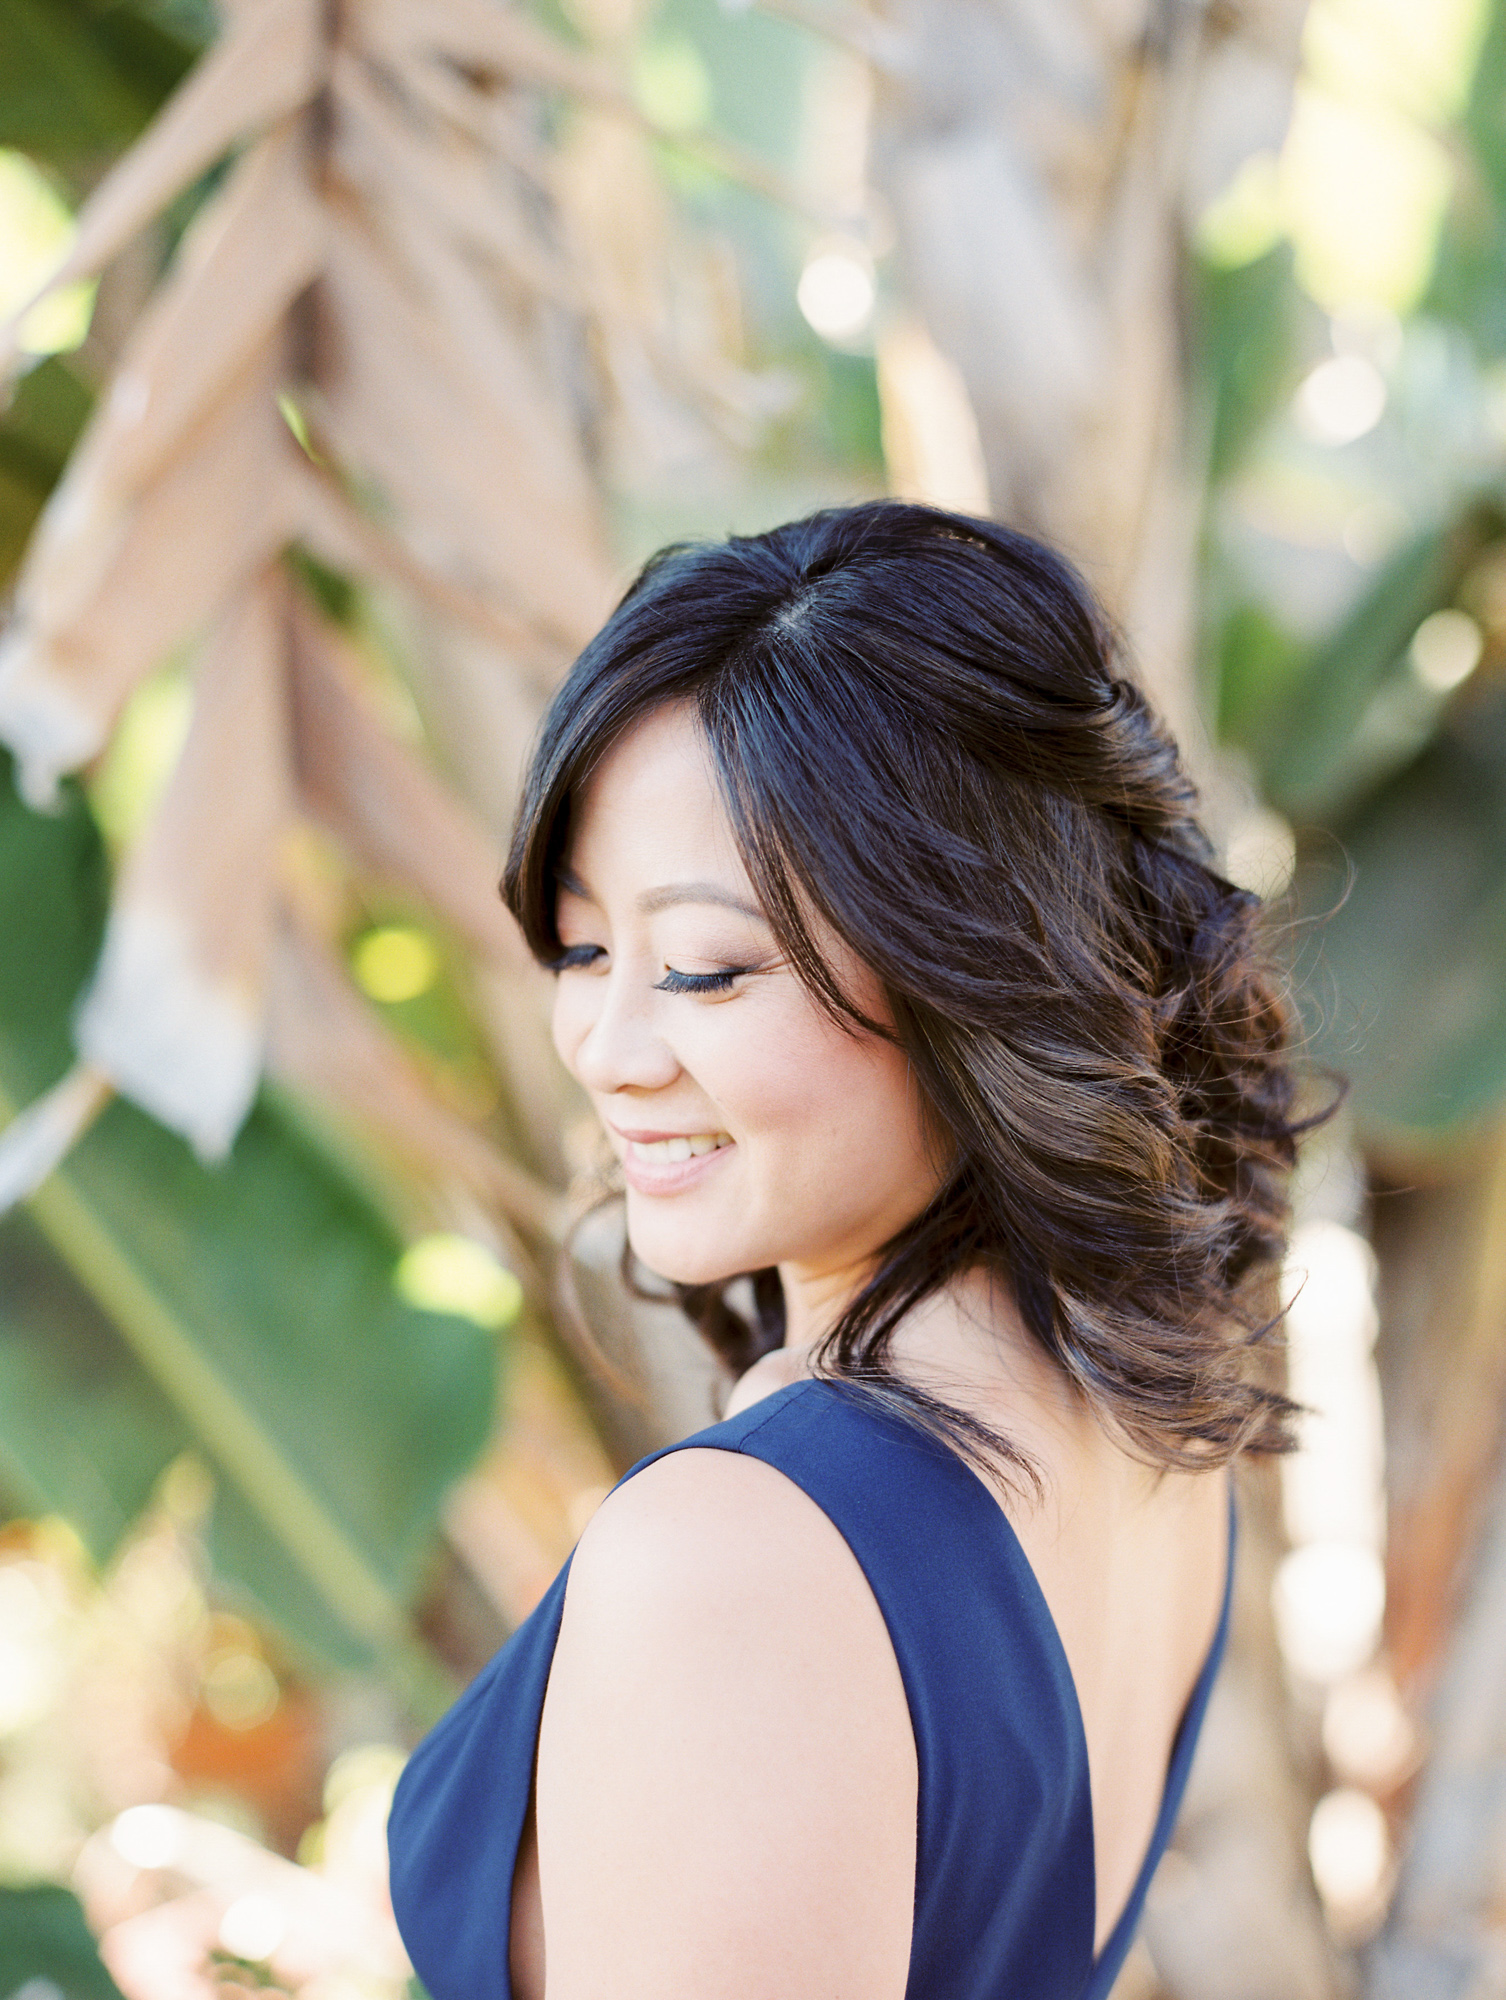 Crystal-Cove-Engagement-Kristina-Adams-8.jpg